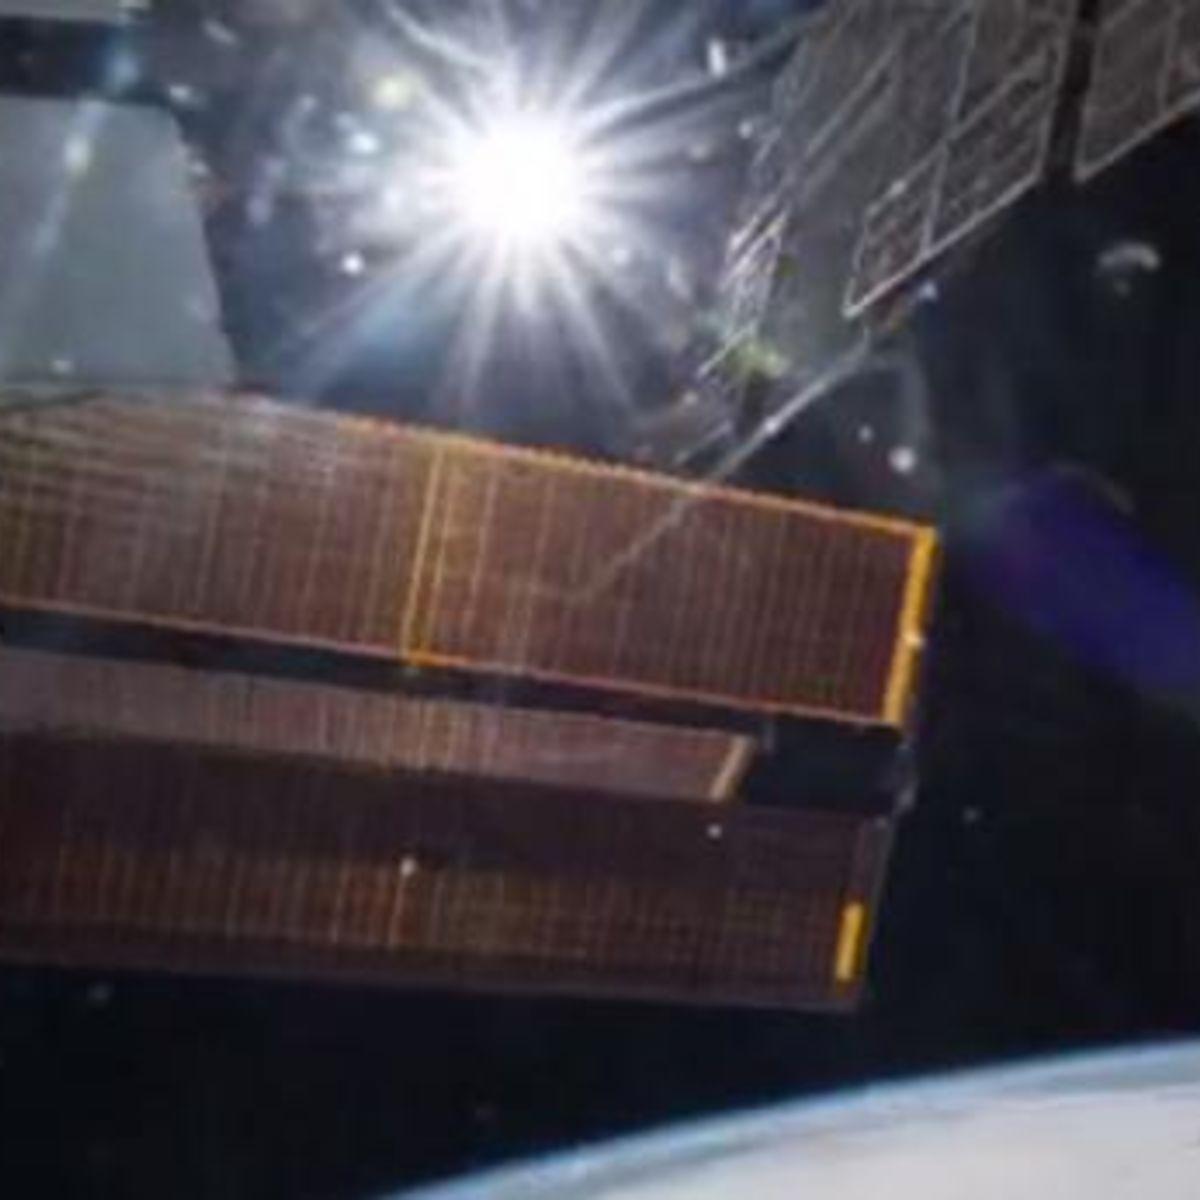 virts_ISS_suncircle.jpg.CROP.rectangle-large.jpg